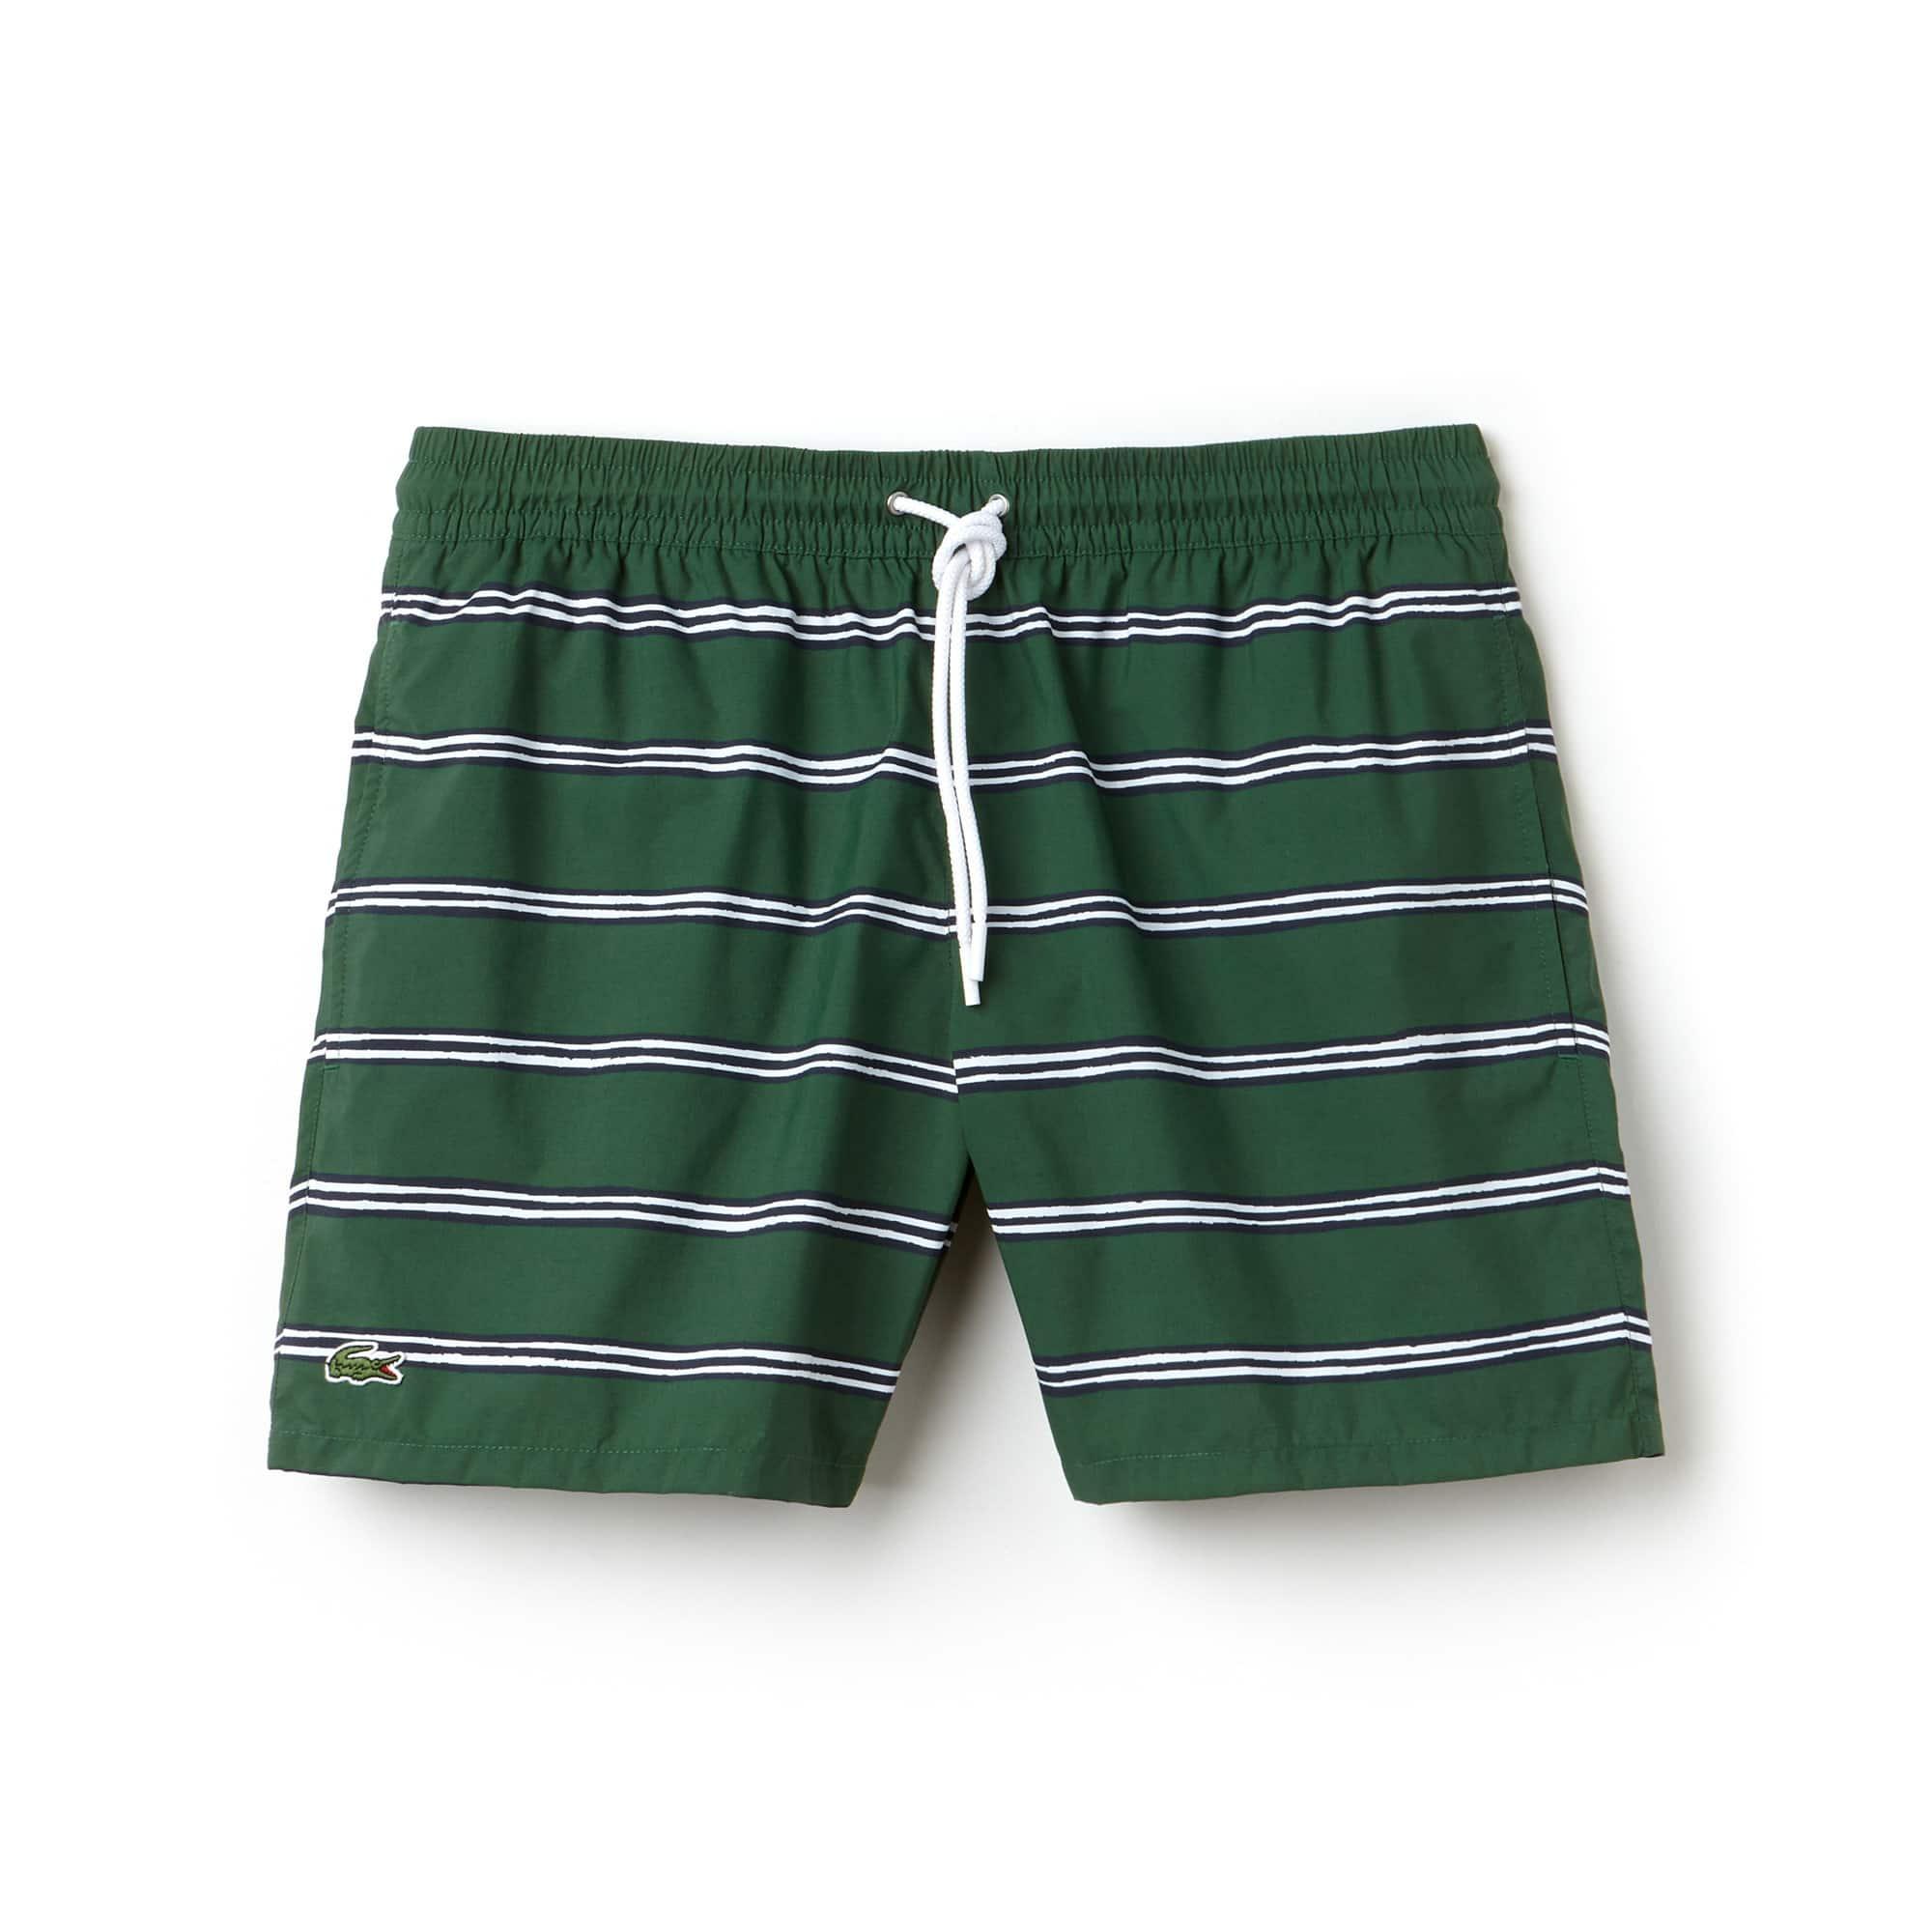 Pantaloncini da bagno in tela a righe